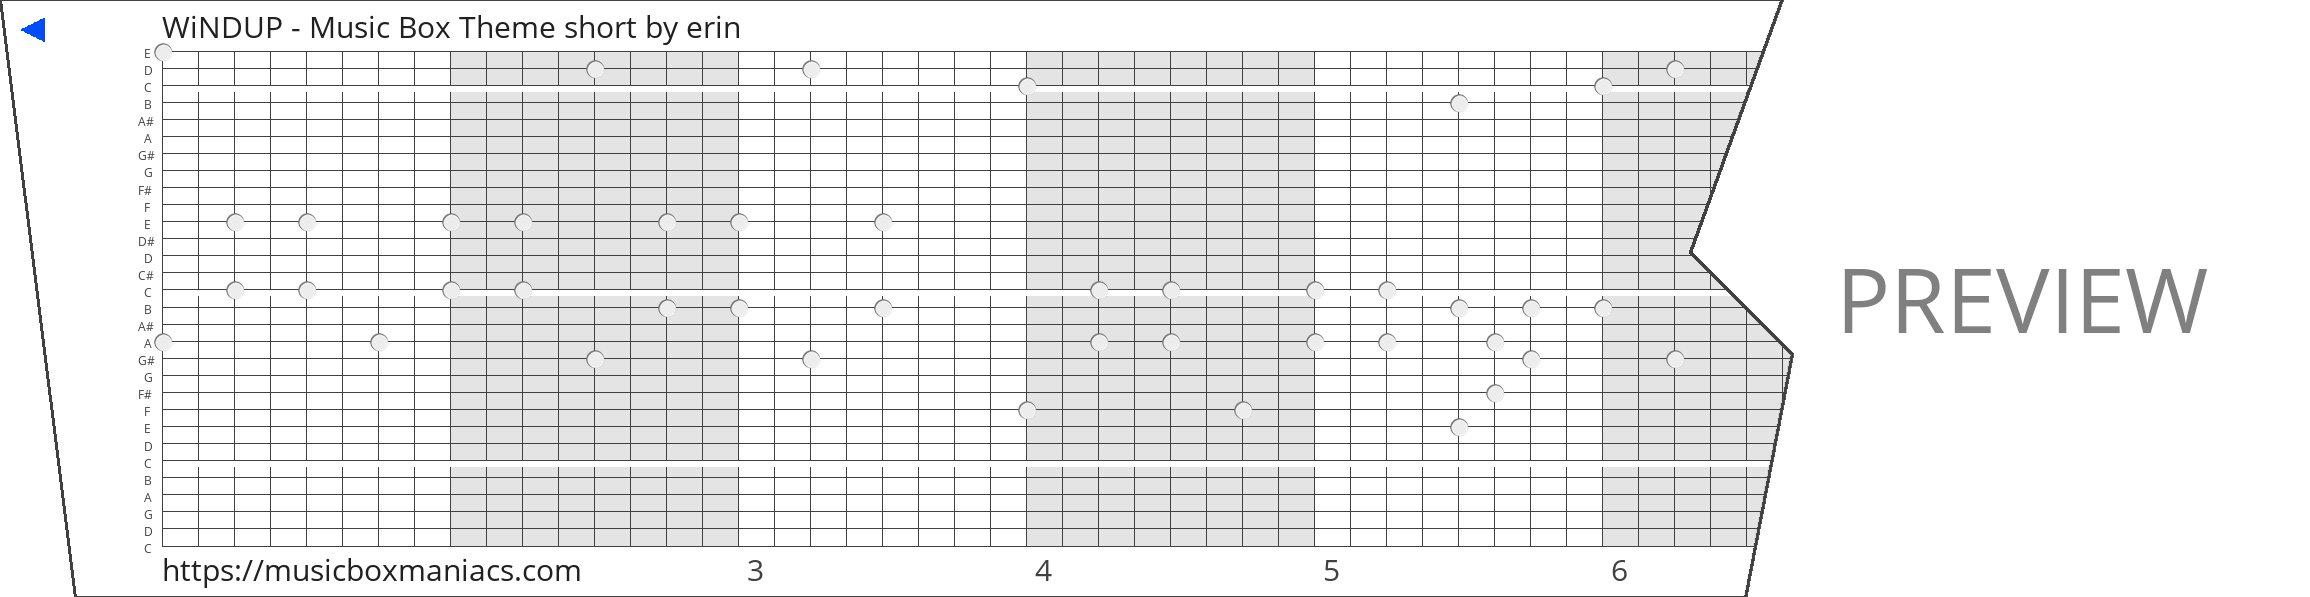 WiNDUP - Music Box Theme short 30 note music box paper strip